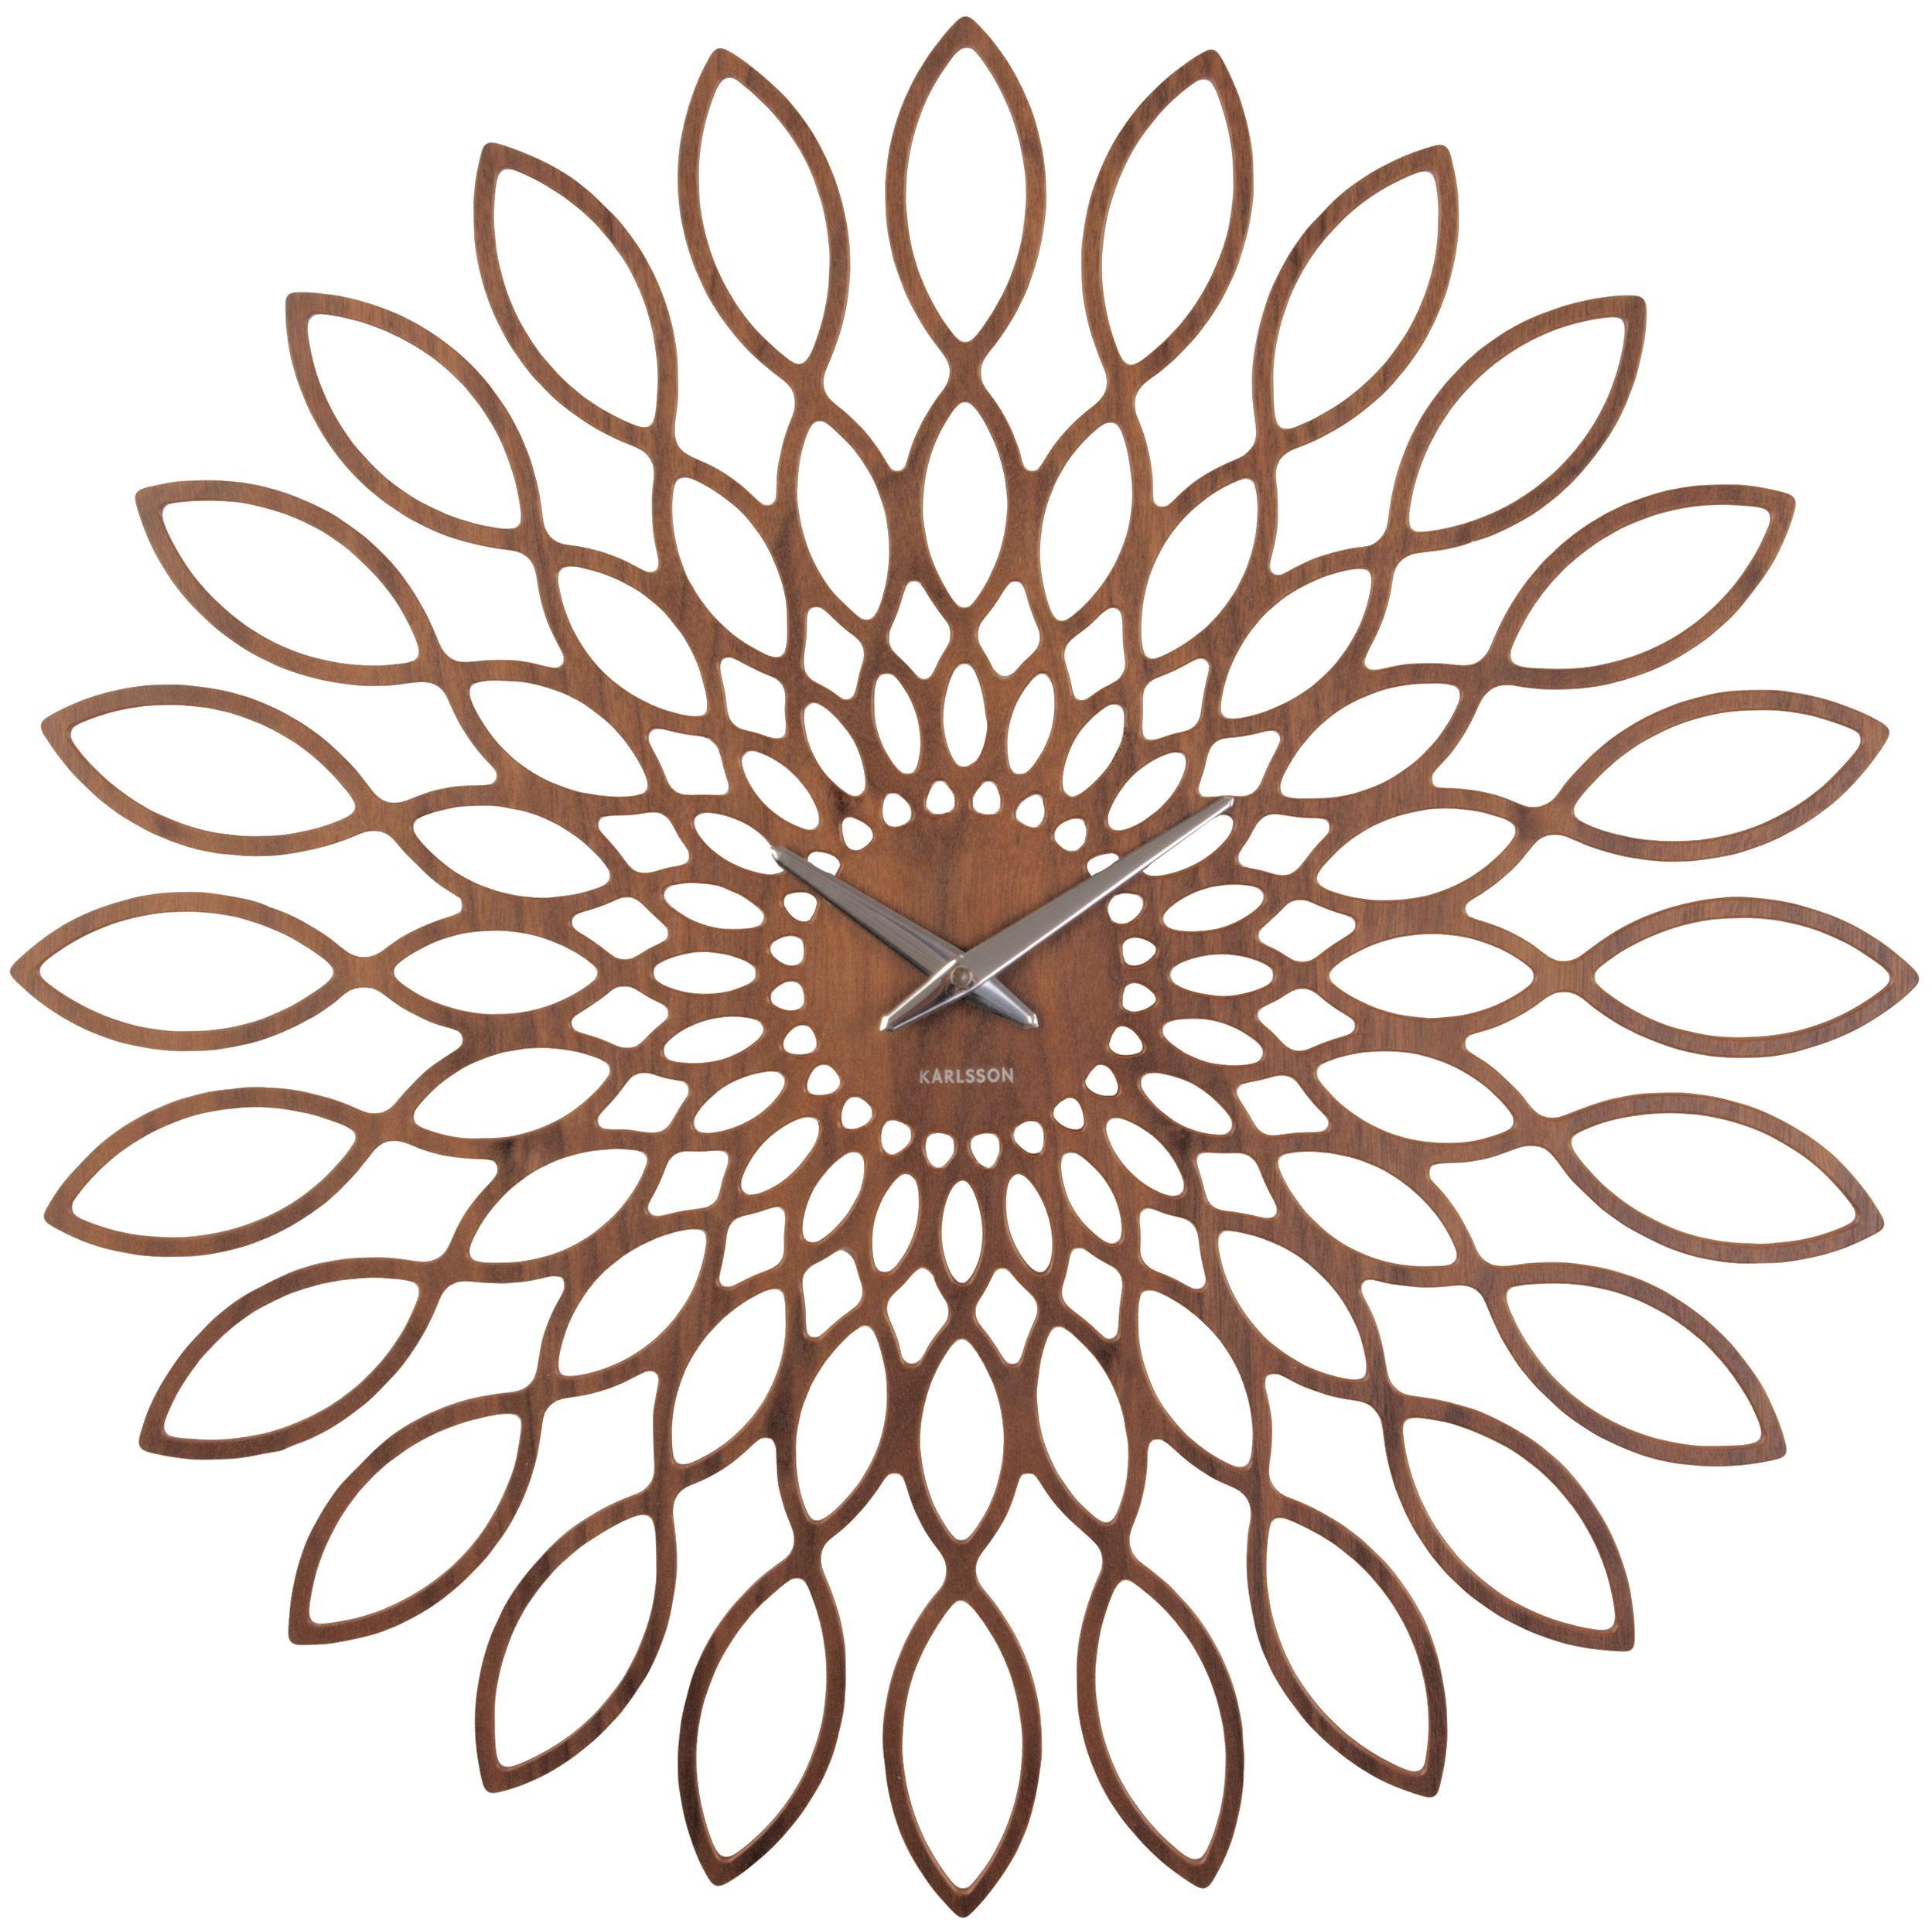 wanduhr karlsson sunflower holz ka5573 g nstig auf laclock. Black Bedroom Furniture Sets. Home Design Ideas